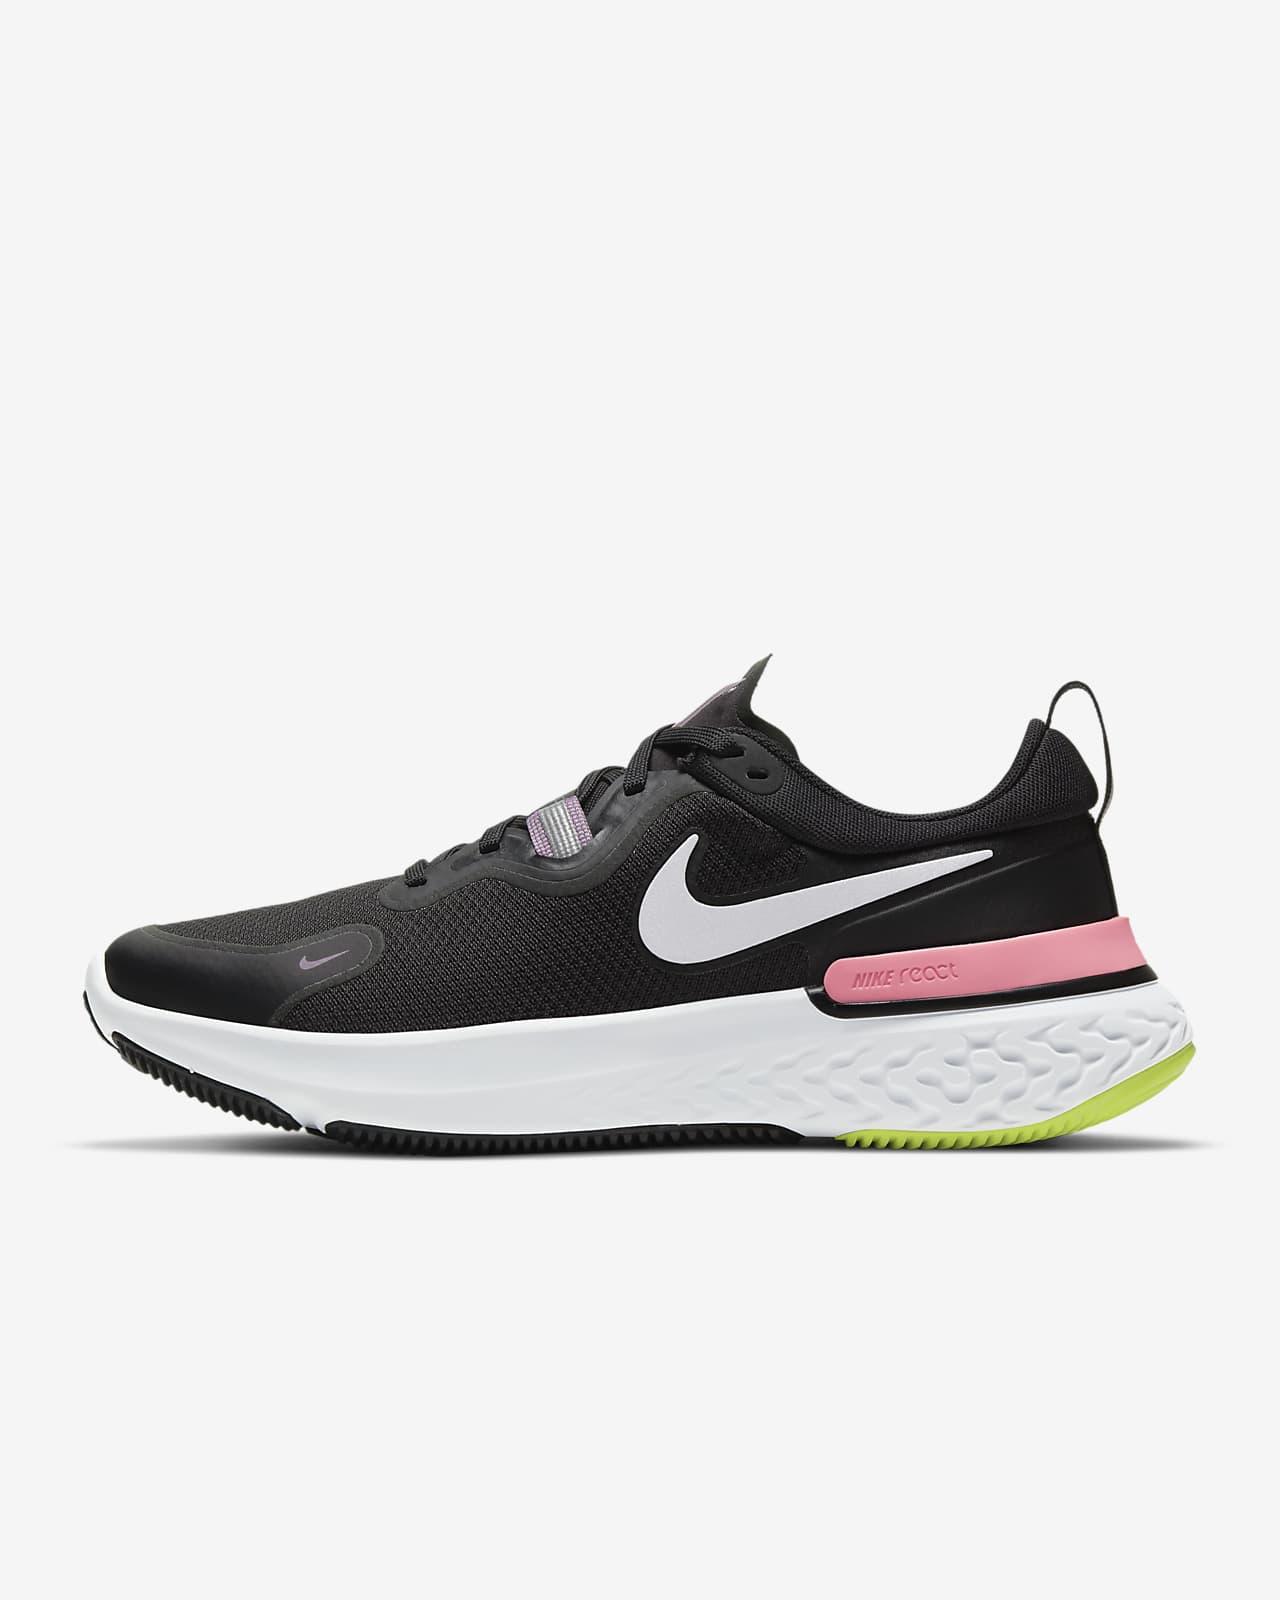 Calzado de running para mujer Nike React Miler